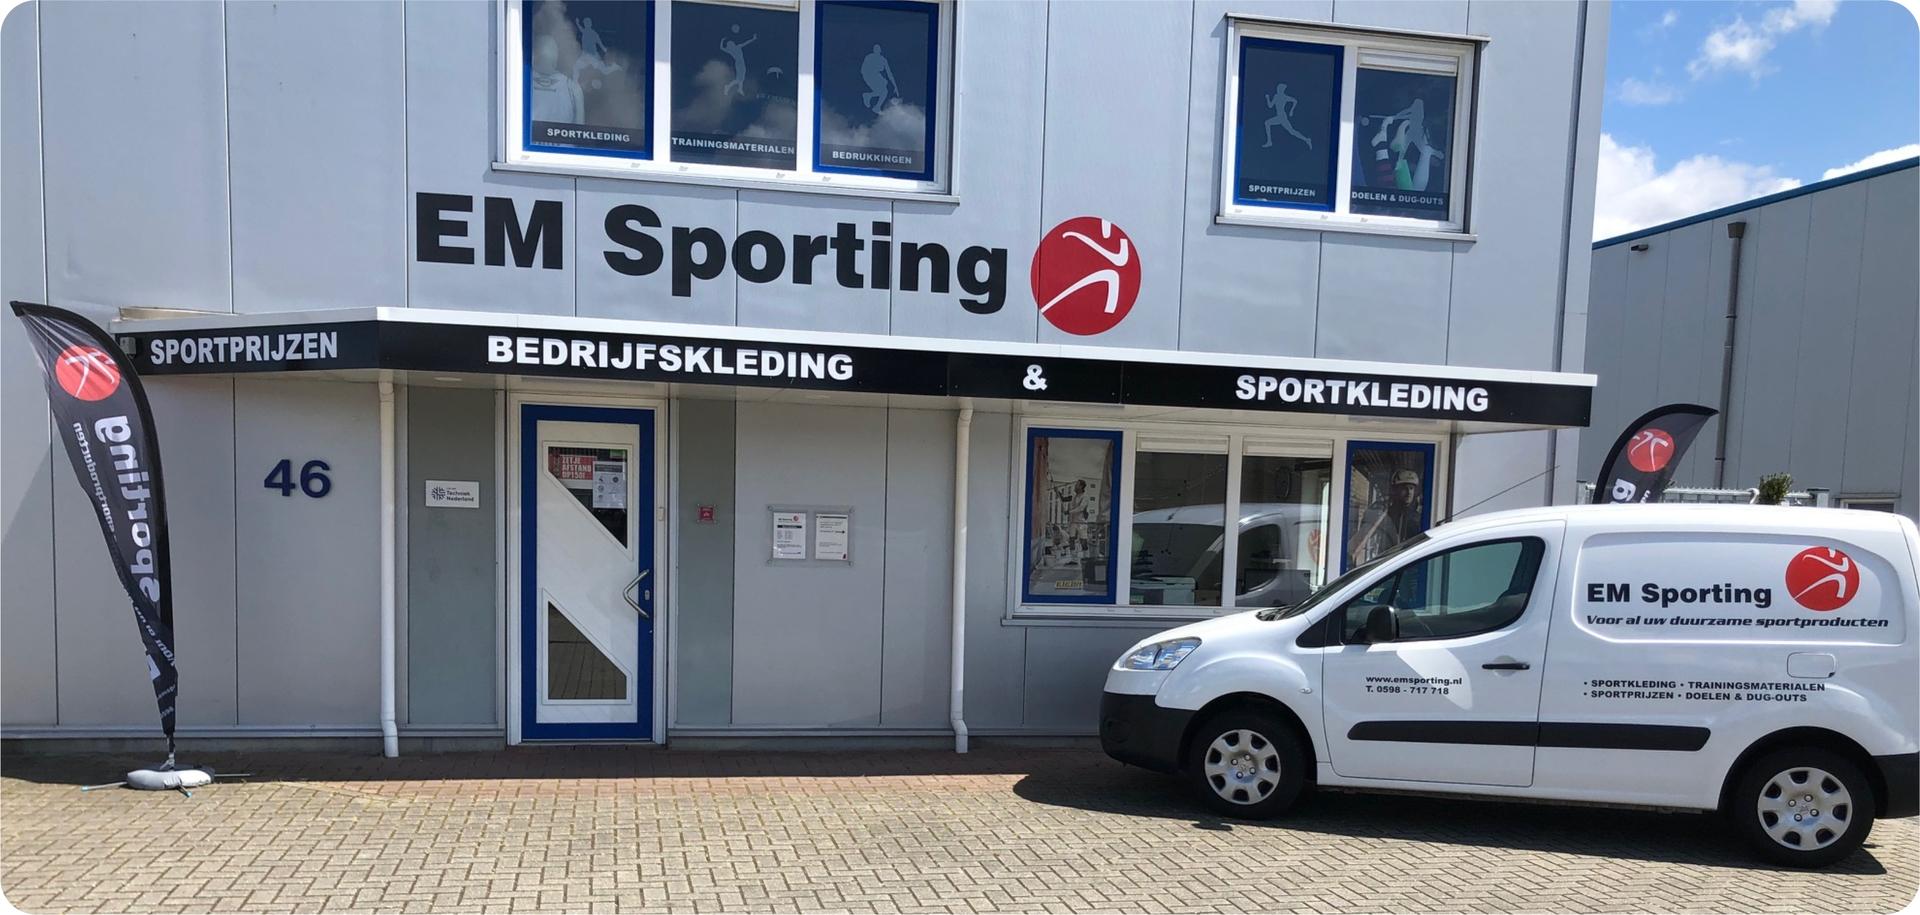 EM Sporting Veendam